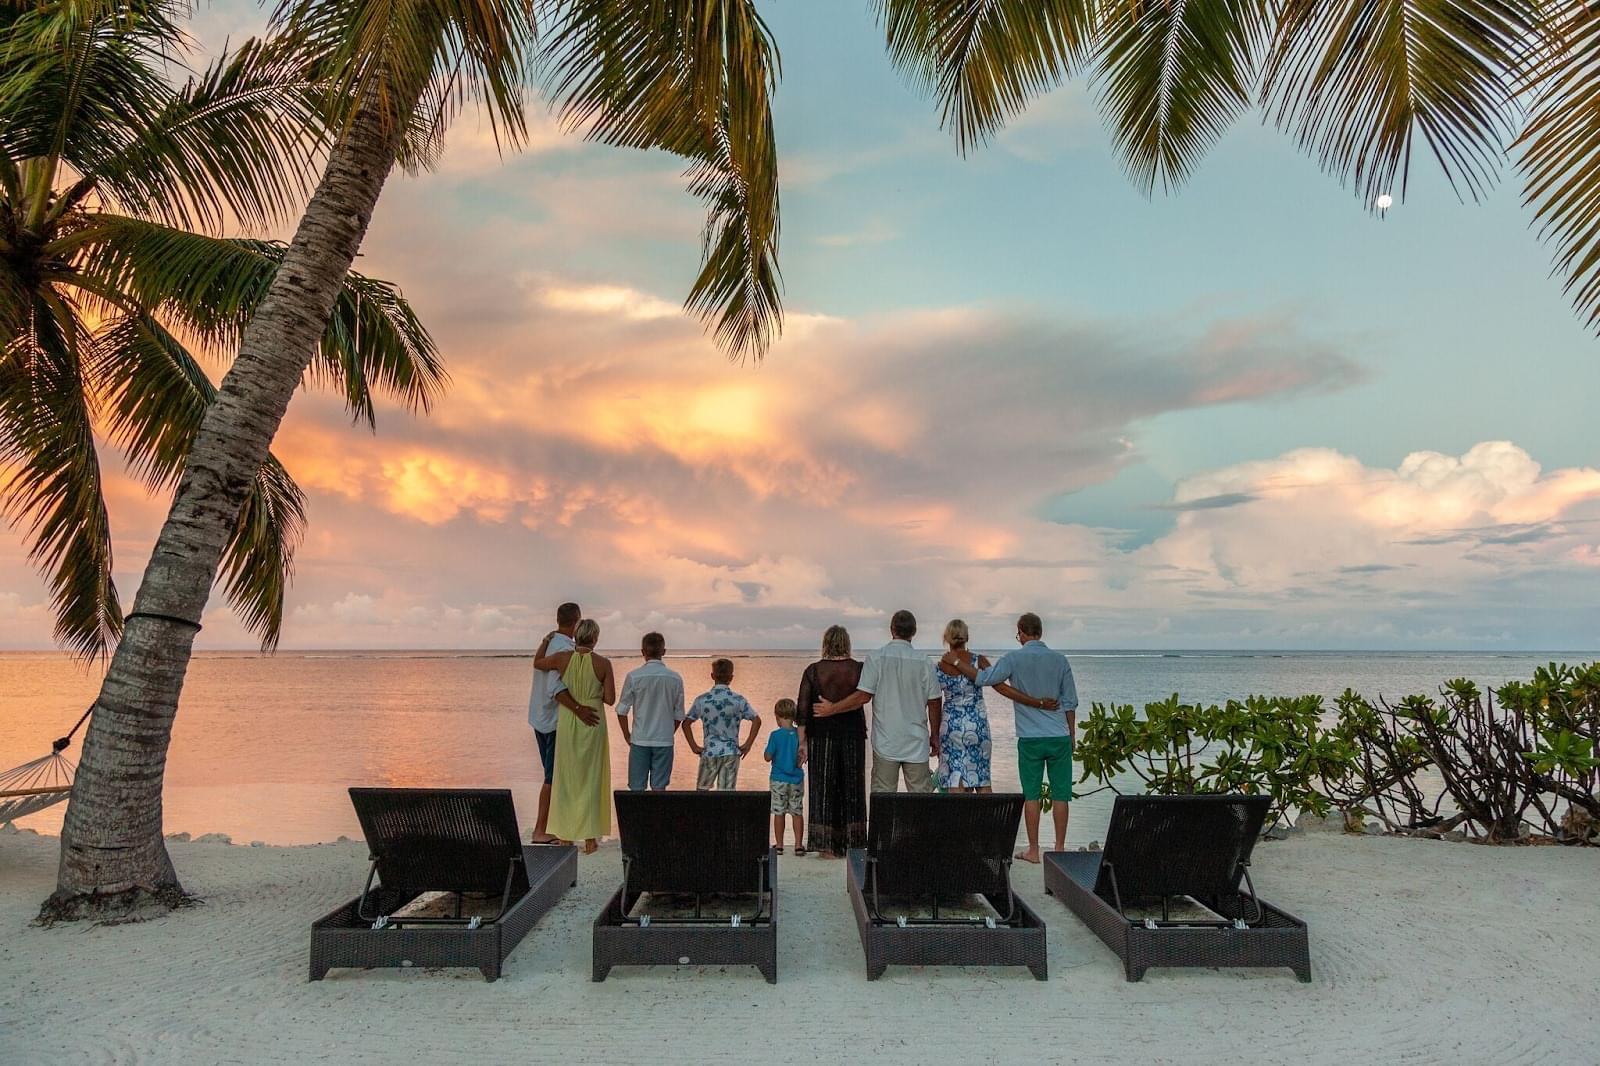 Alphonse Island Seychelles, fishing, Indian Ocean, Aardvark McLeod, family holiday,